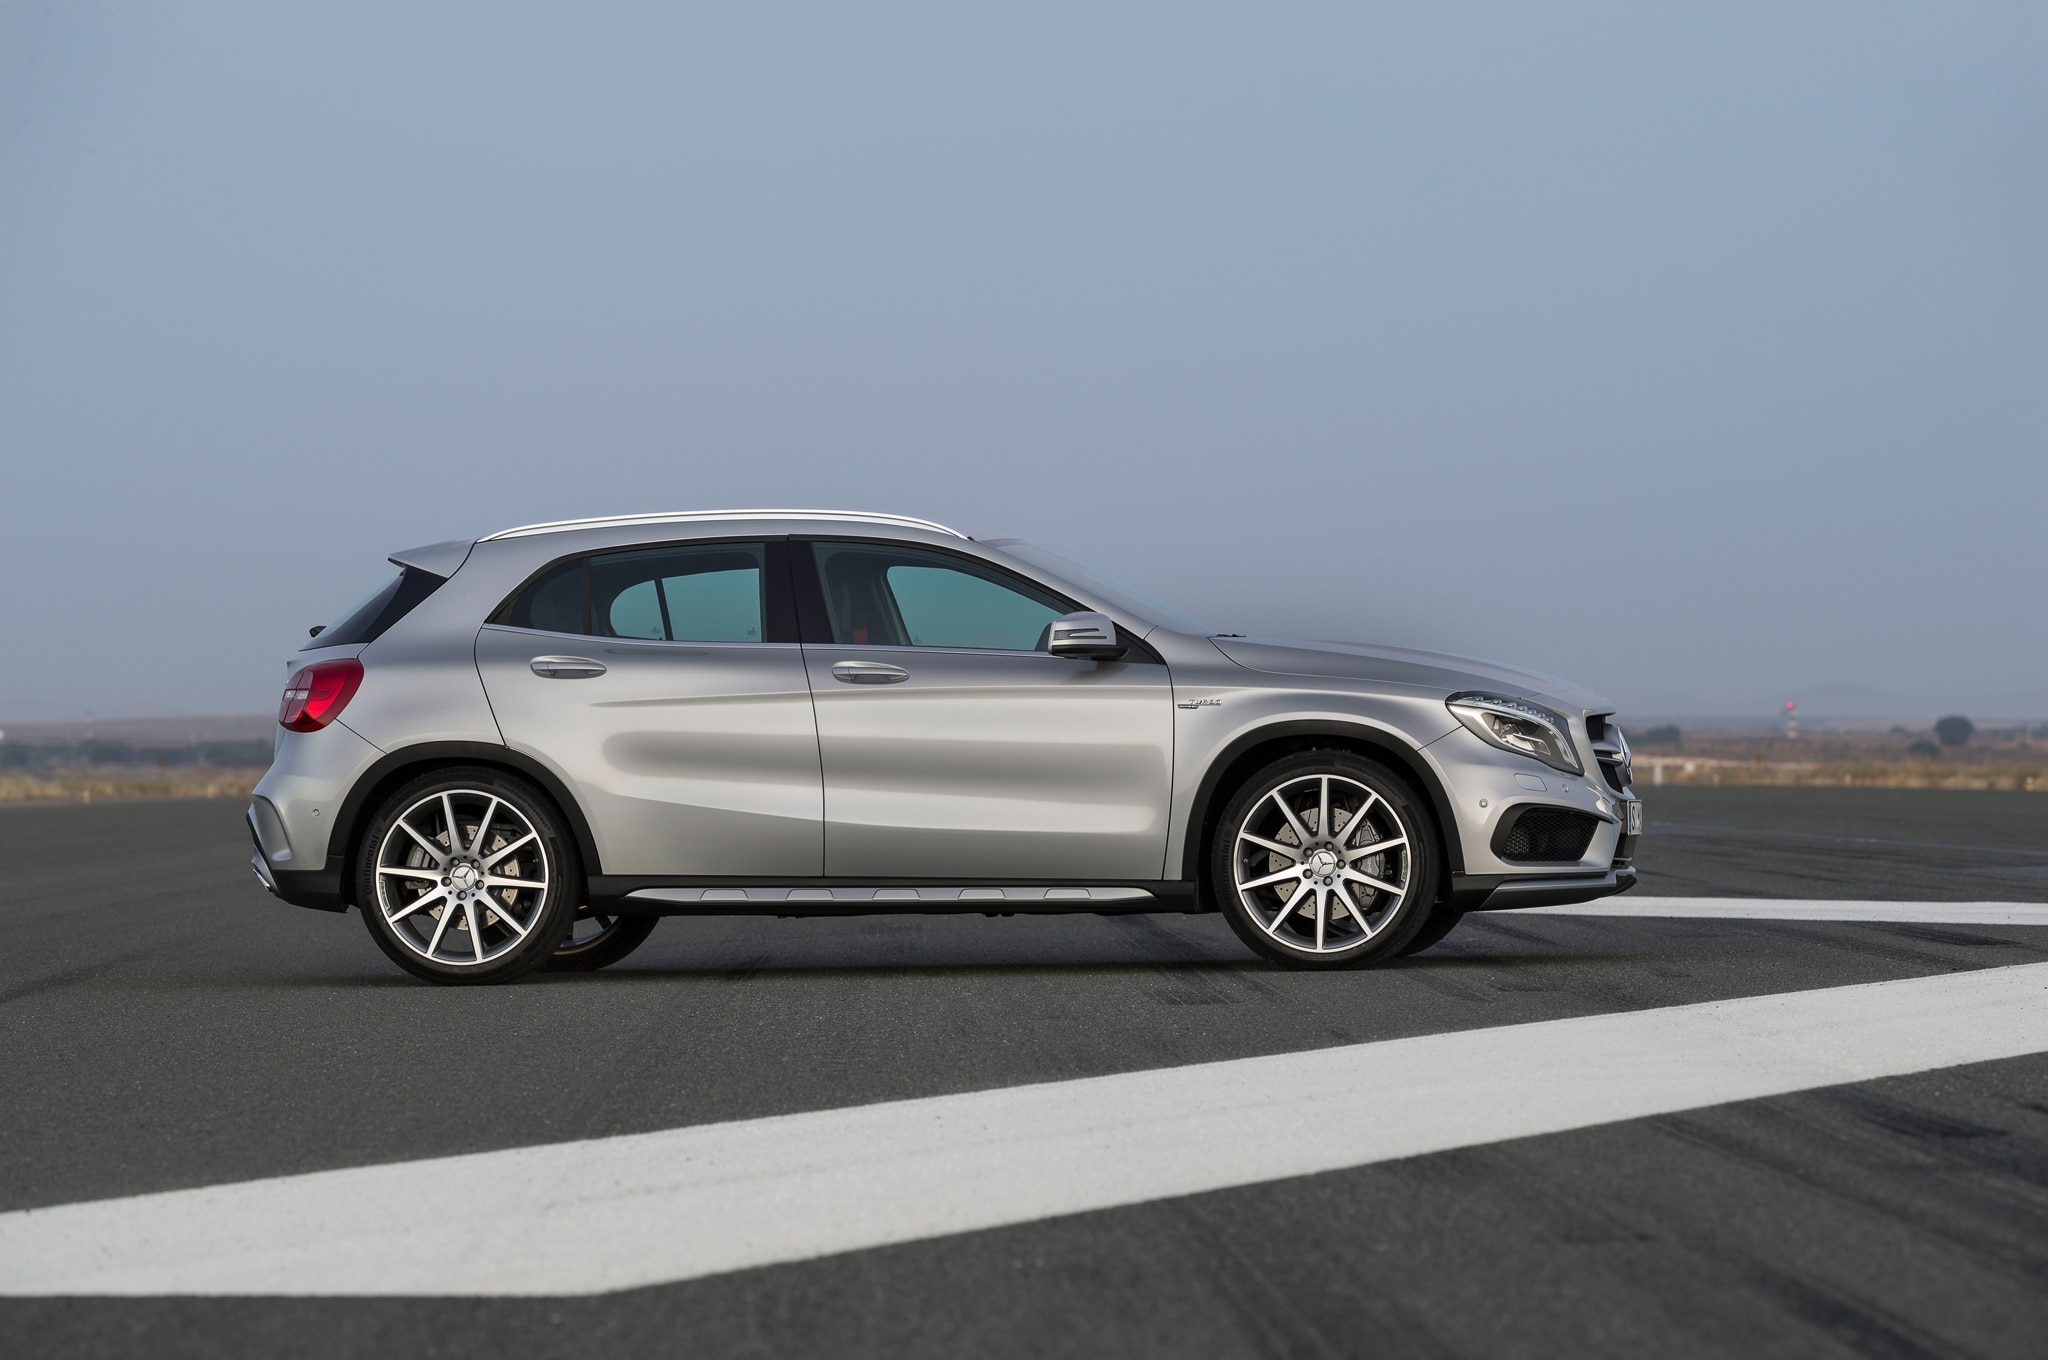 2015 mercedes benz gla class starts at 32 225 gla45 amg for Mercedes benz 2015 gla